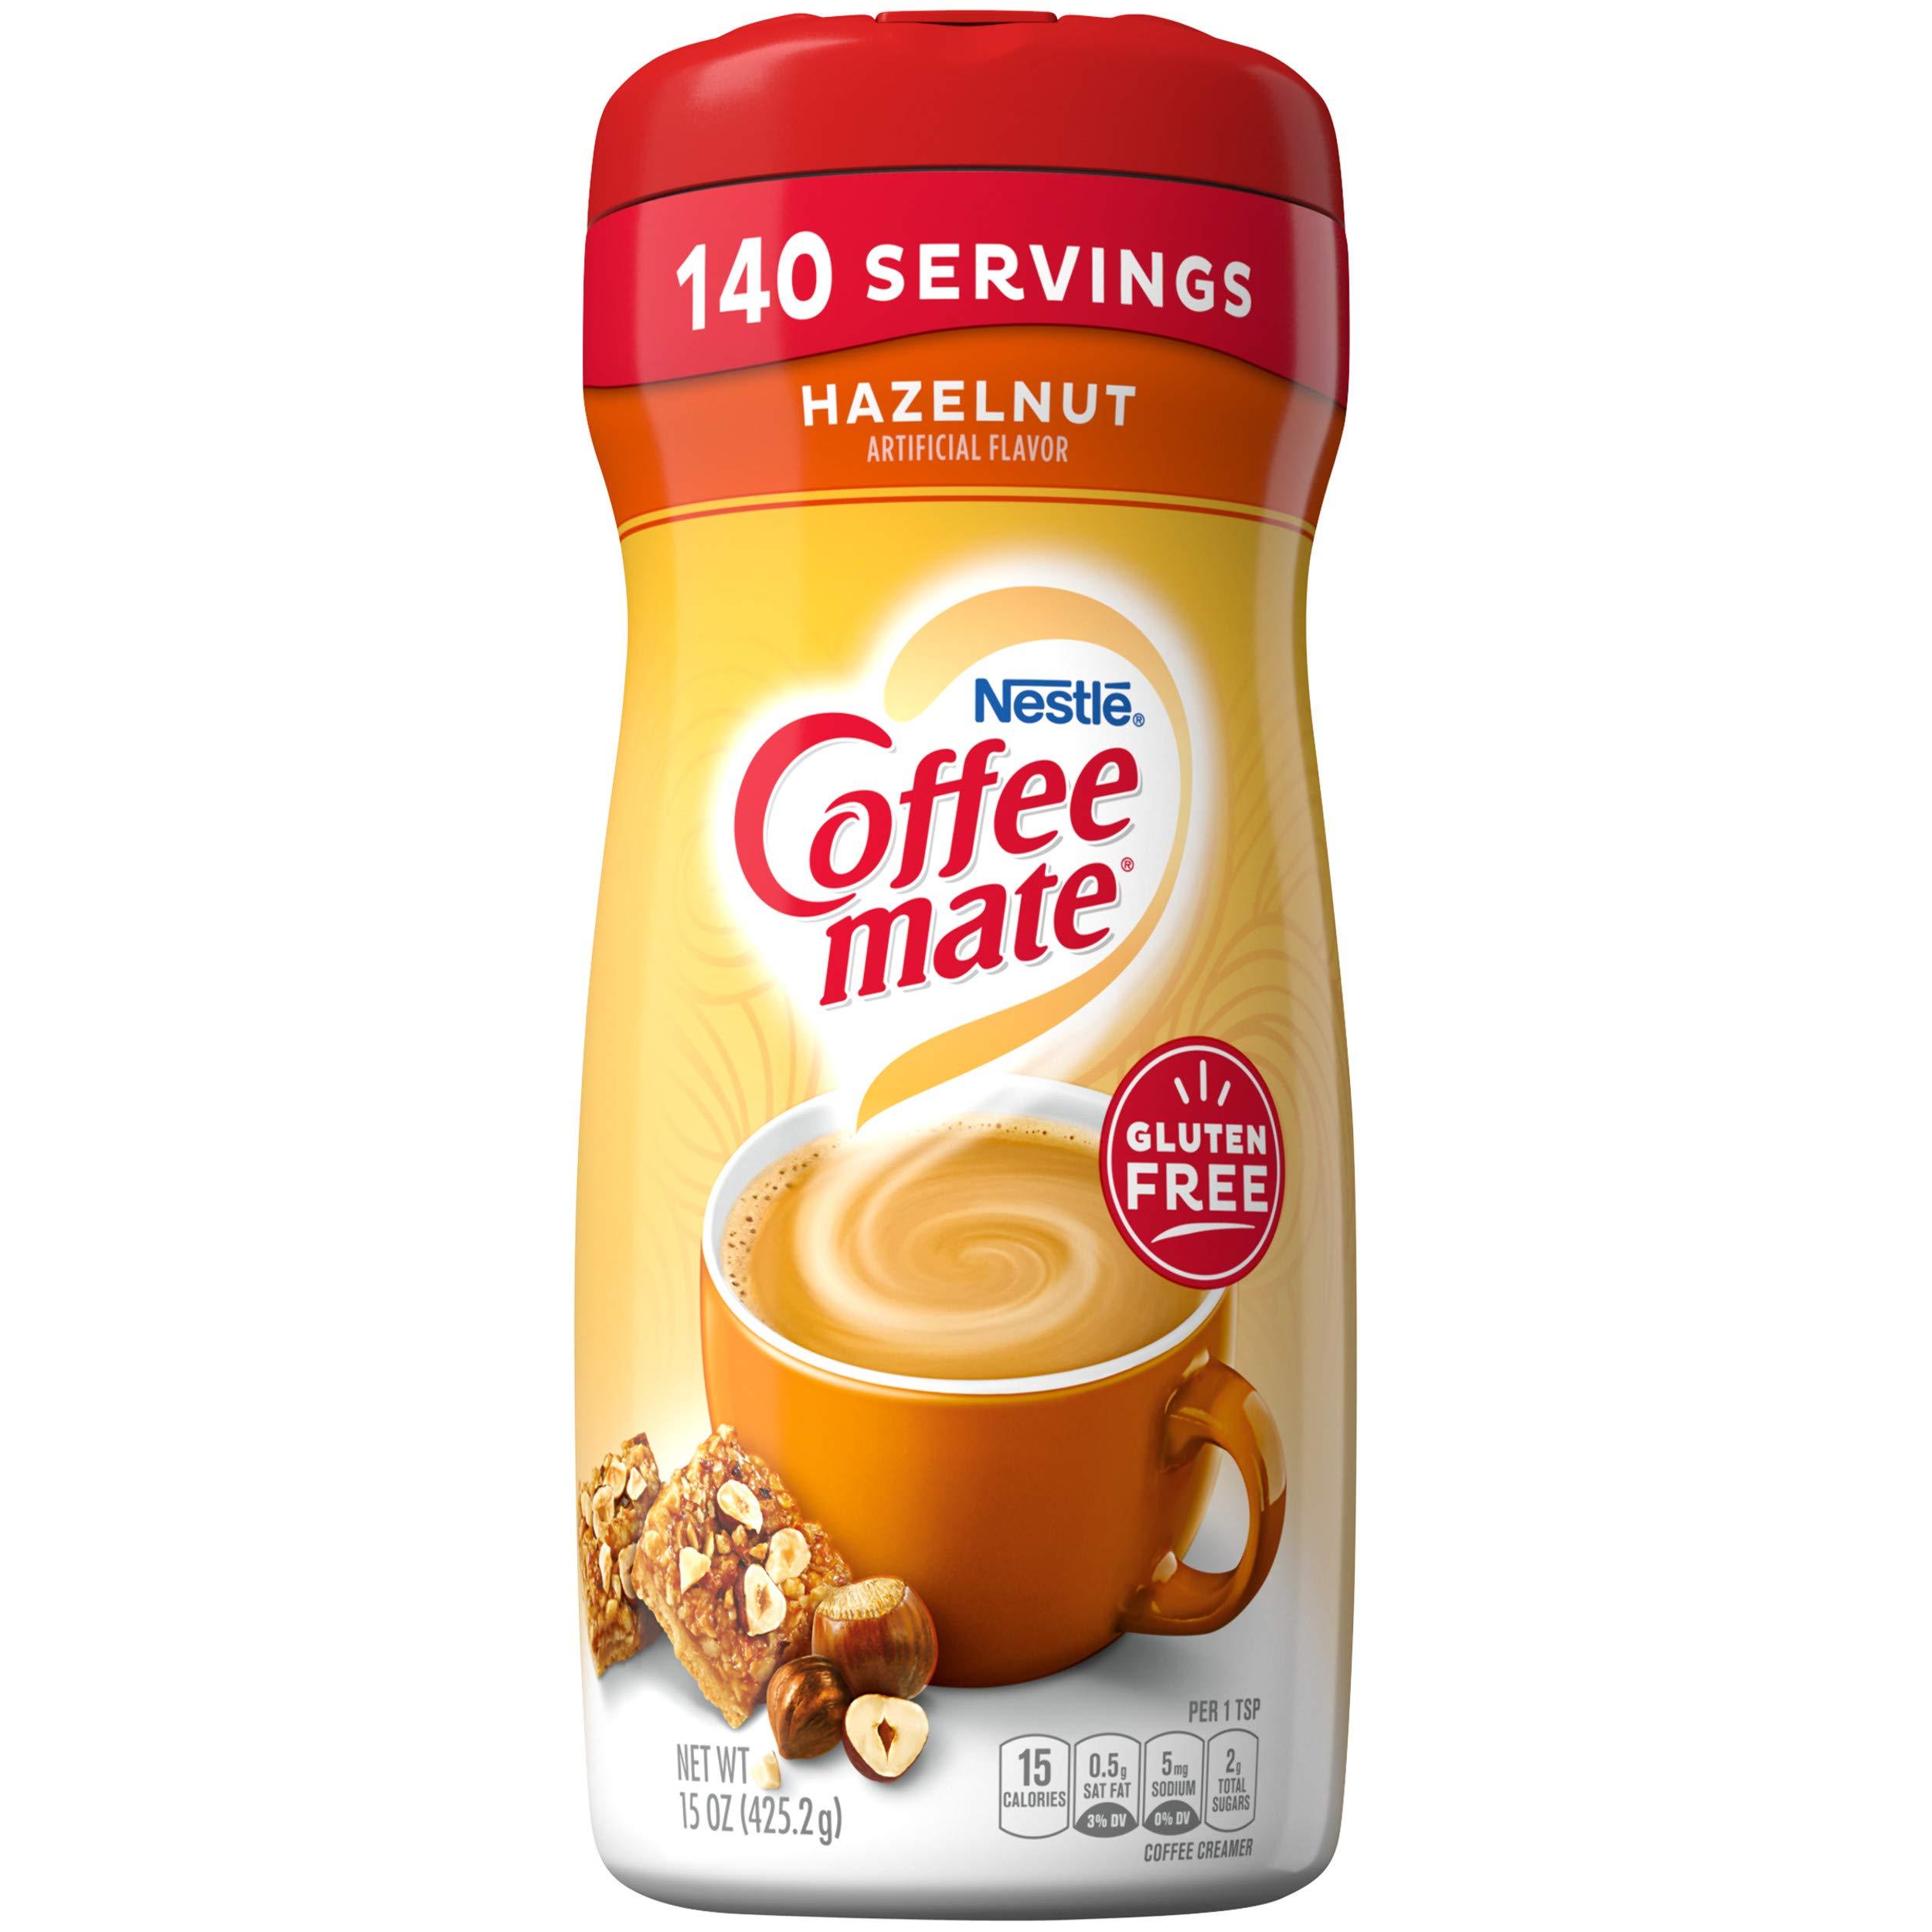 COFFEE MATE Hazelnut Powder Coffee Creamer 15 Oz. Canister   Non-dairy, Lactose Free, Gluten Free Creamer